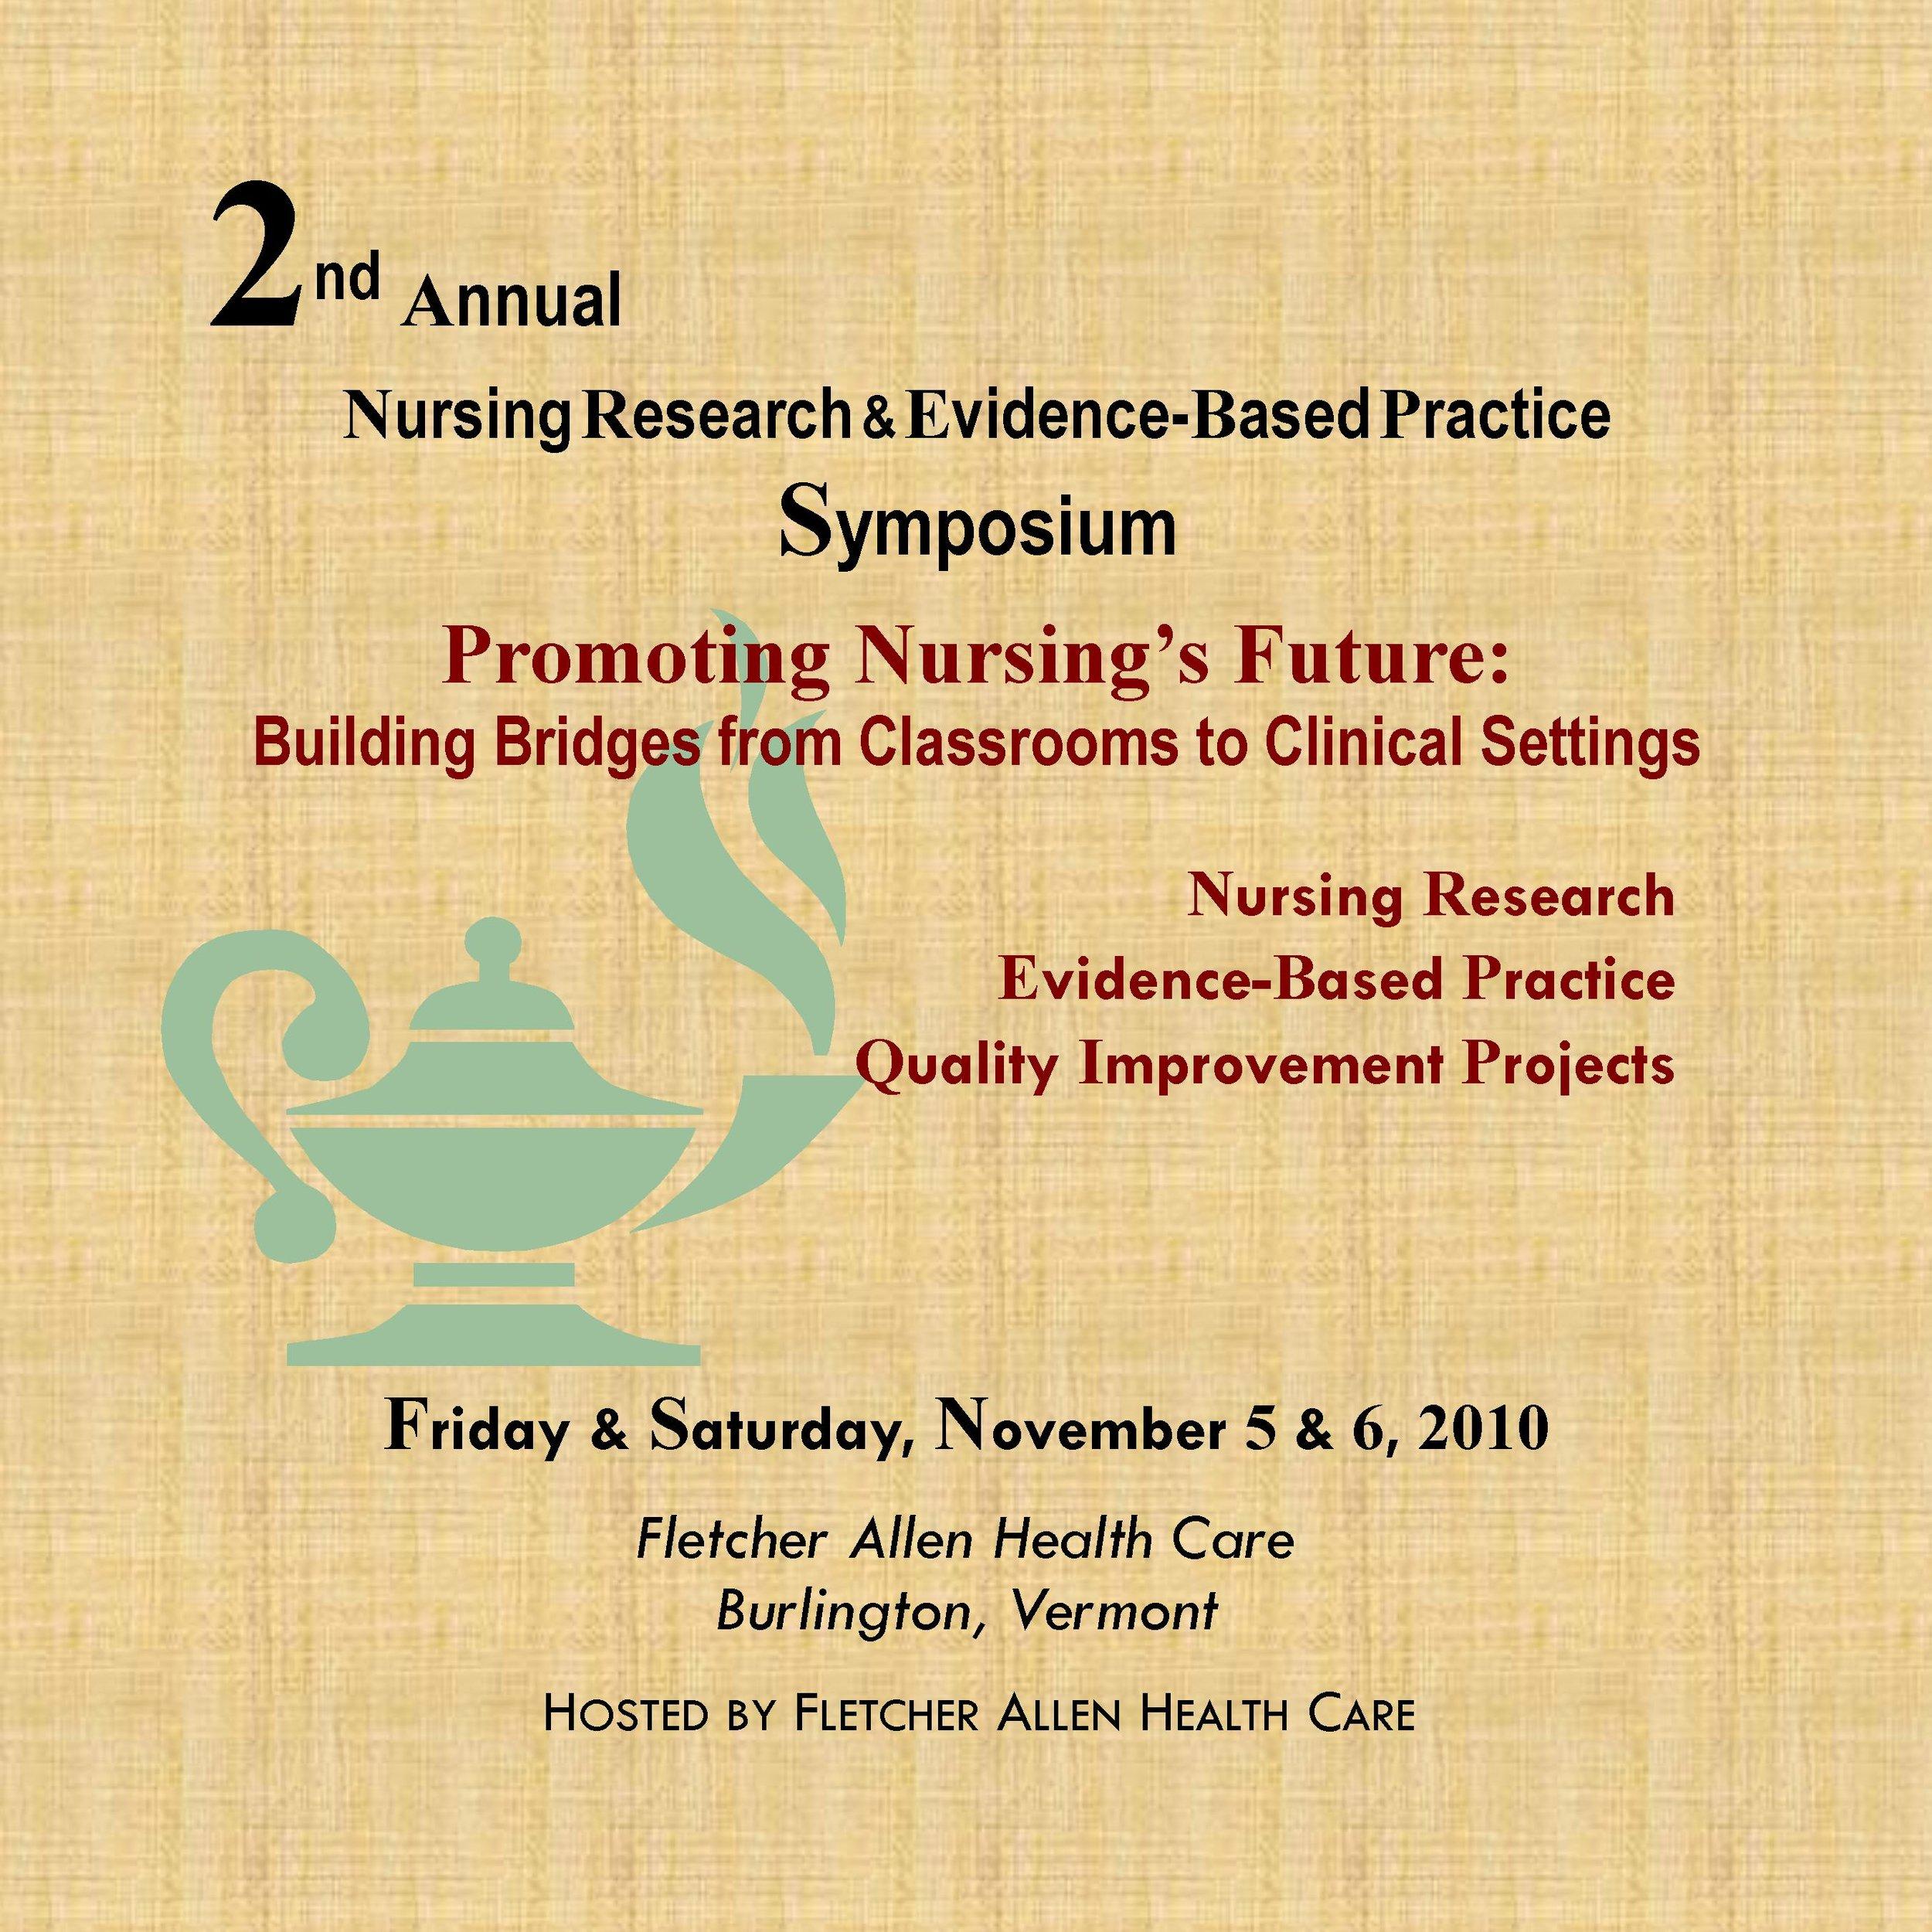 Lauren Goodloe, PhD, RN, NEA-BC